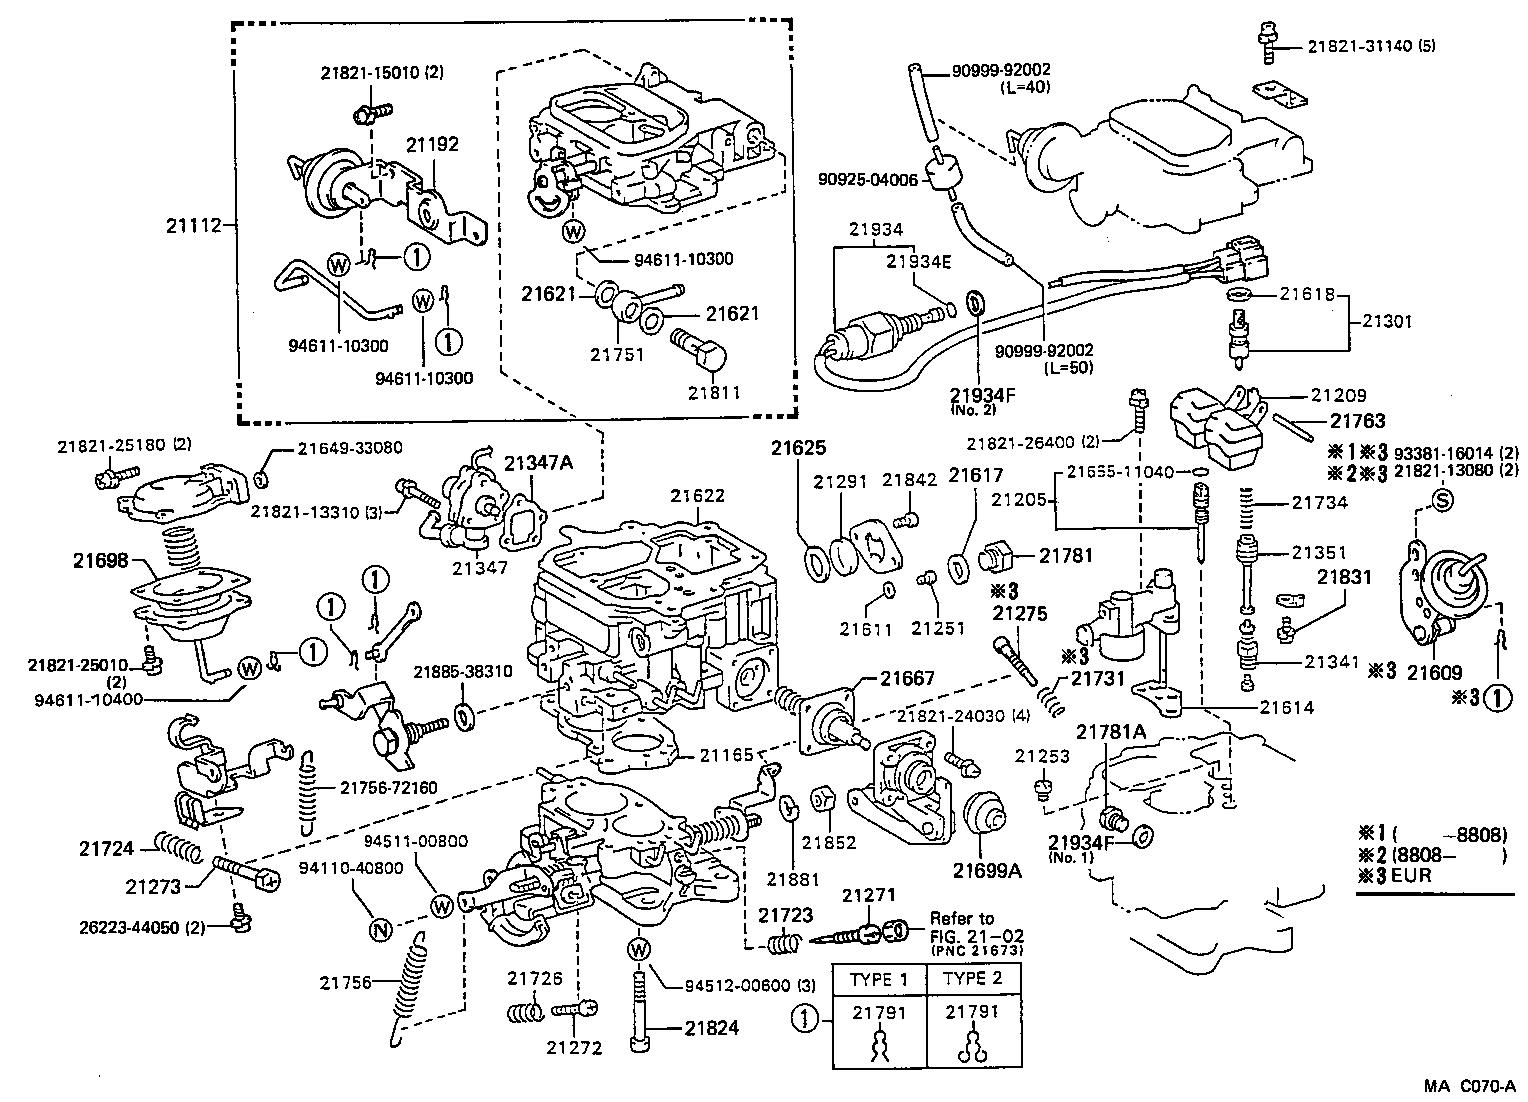 Toyota Celica Wiring Diagram Toyota Wiring Diagram